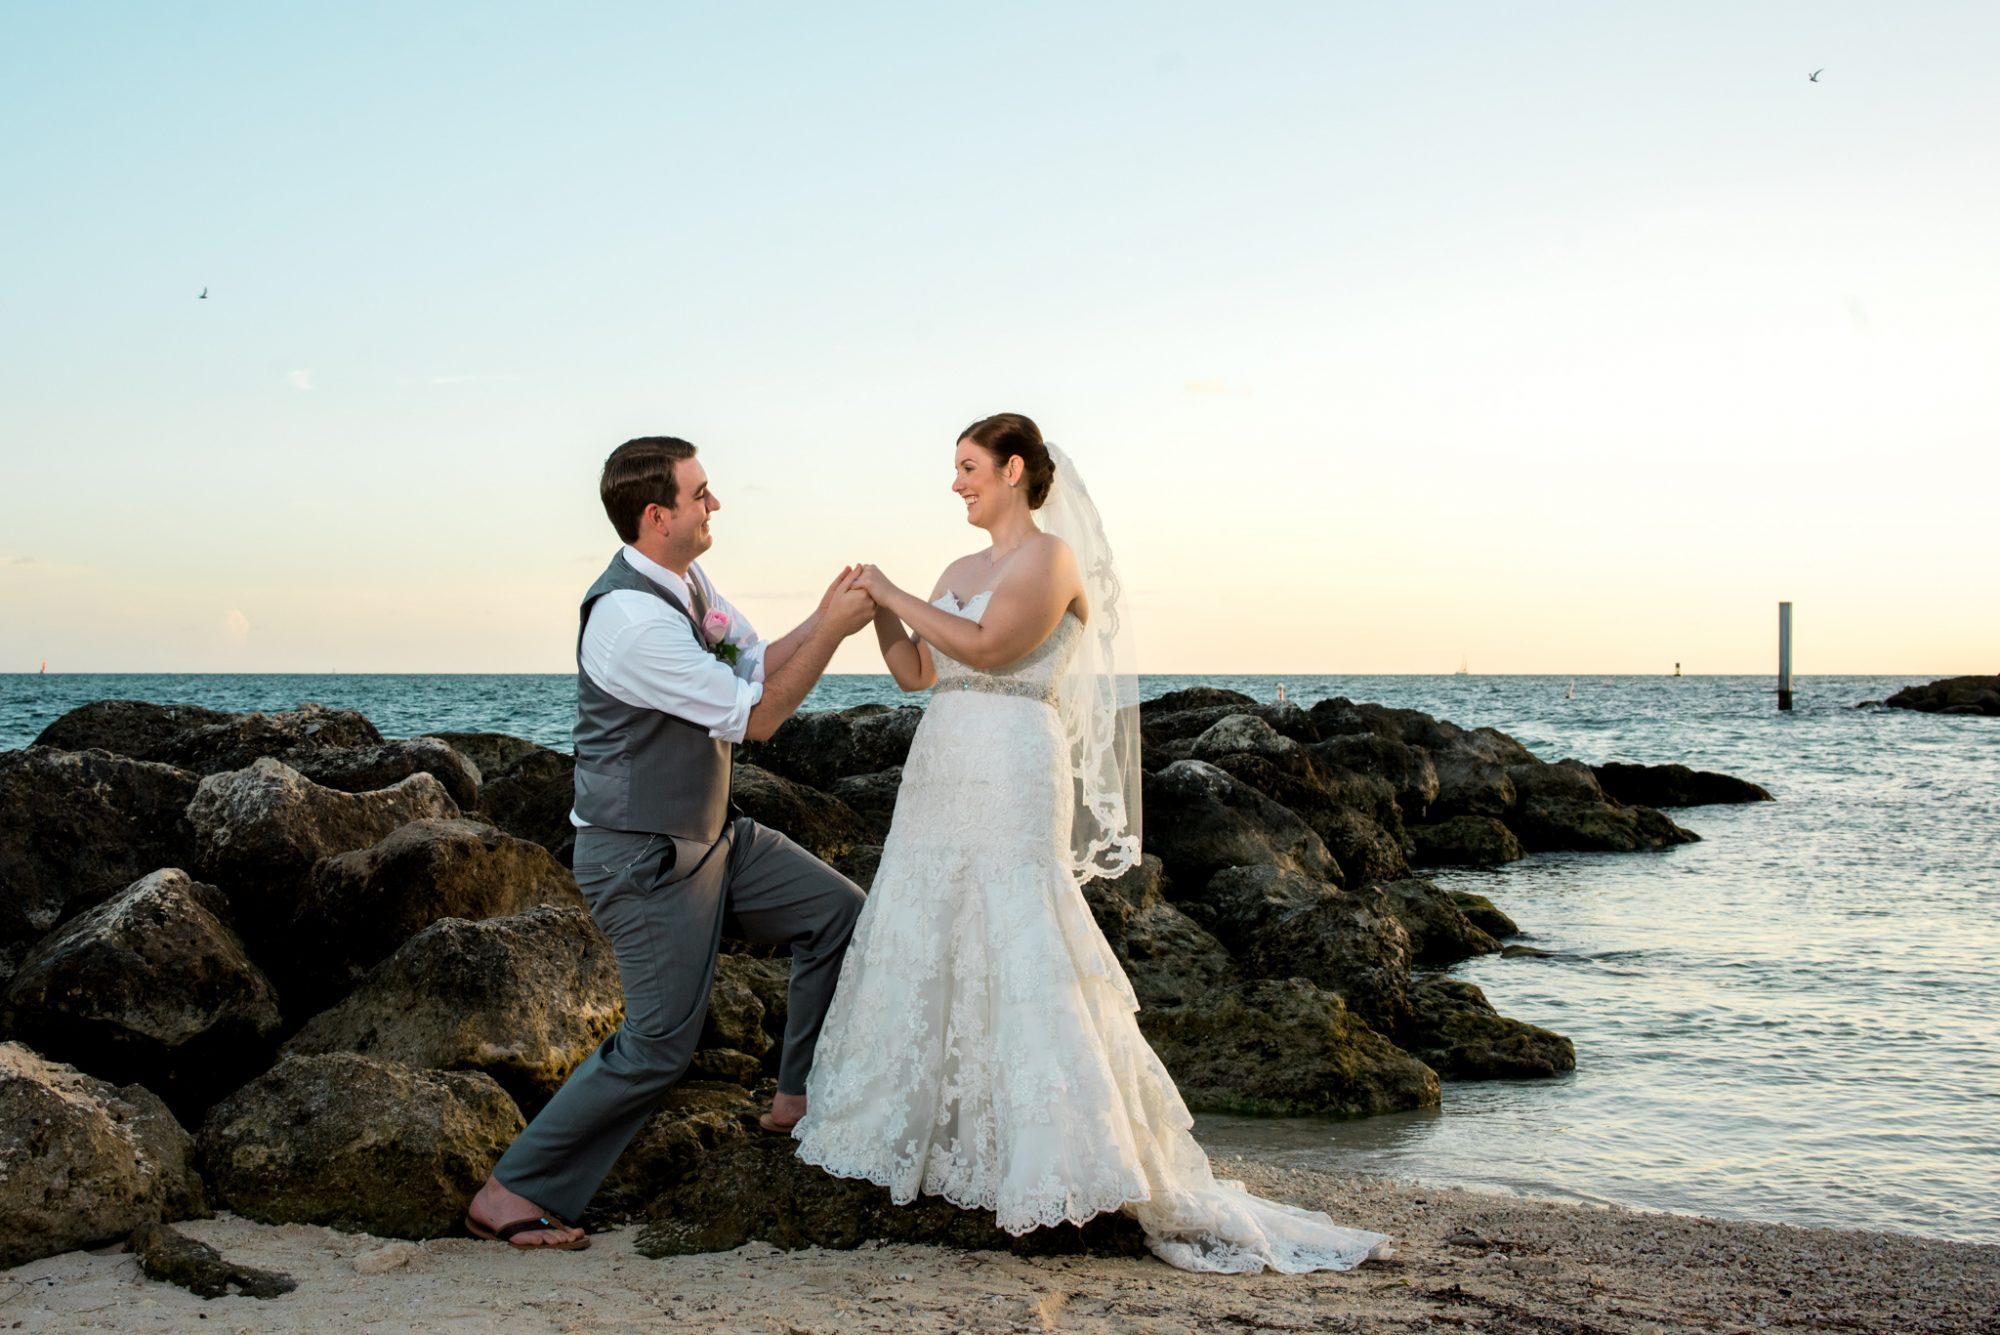 Heather Jeff Key West Wedding Photographer Fort Zachary Taylor 29 - Heather & Jeff - Key West Wedding Photographer - Fort Zachary Taylor